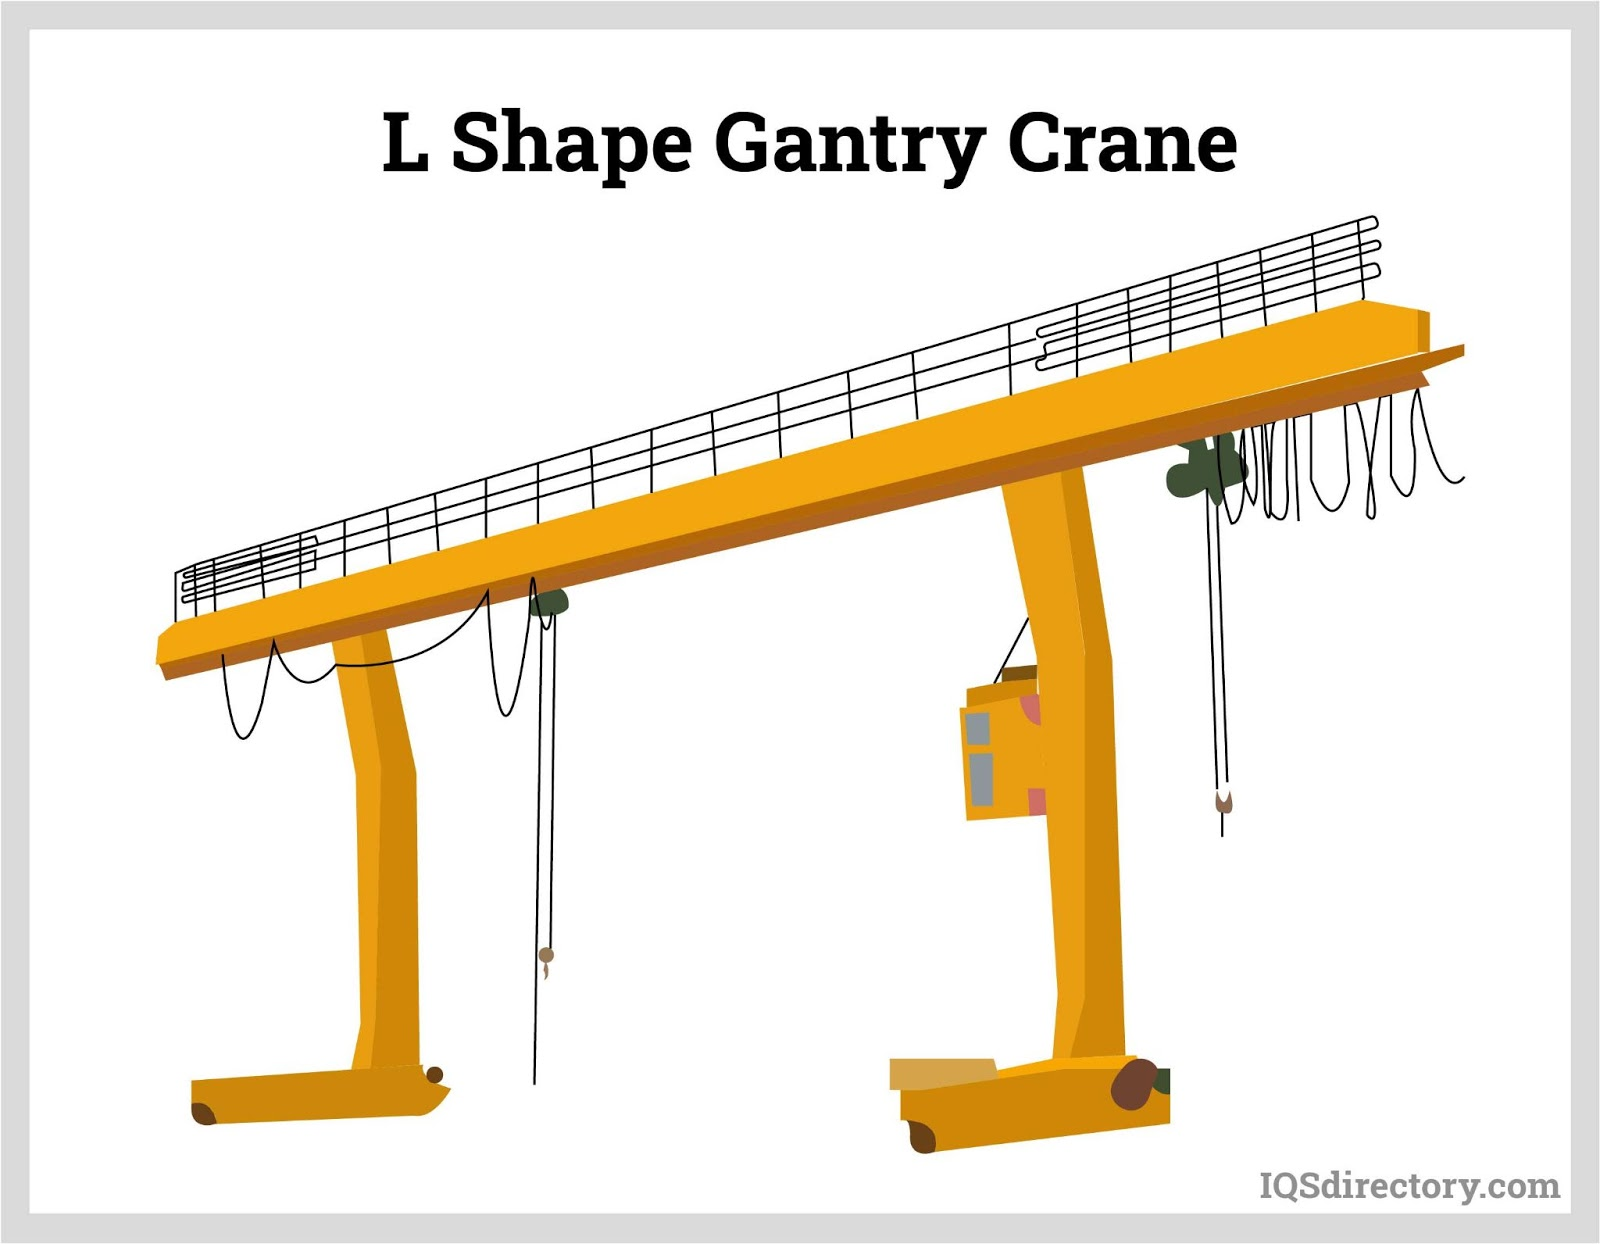 L Shape Gantry Crane